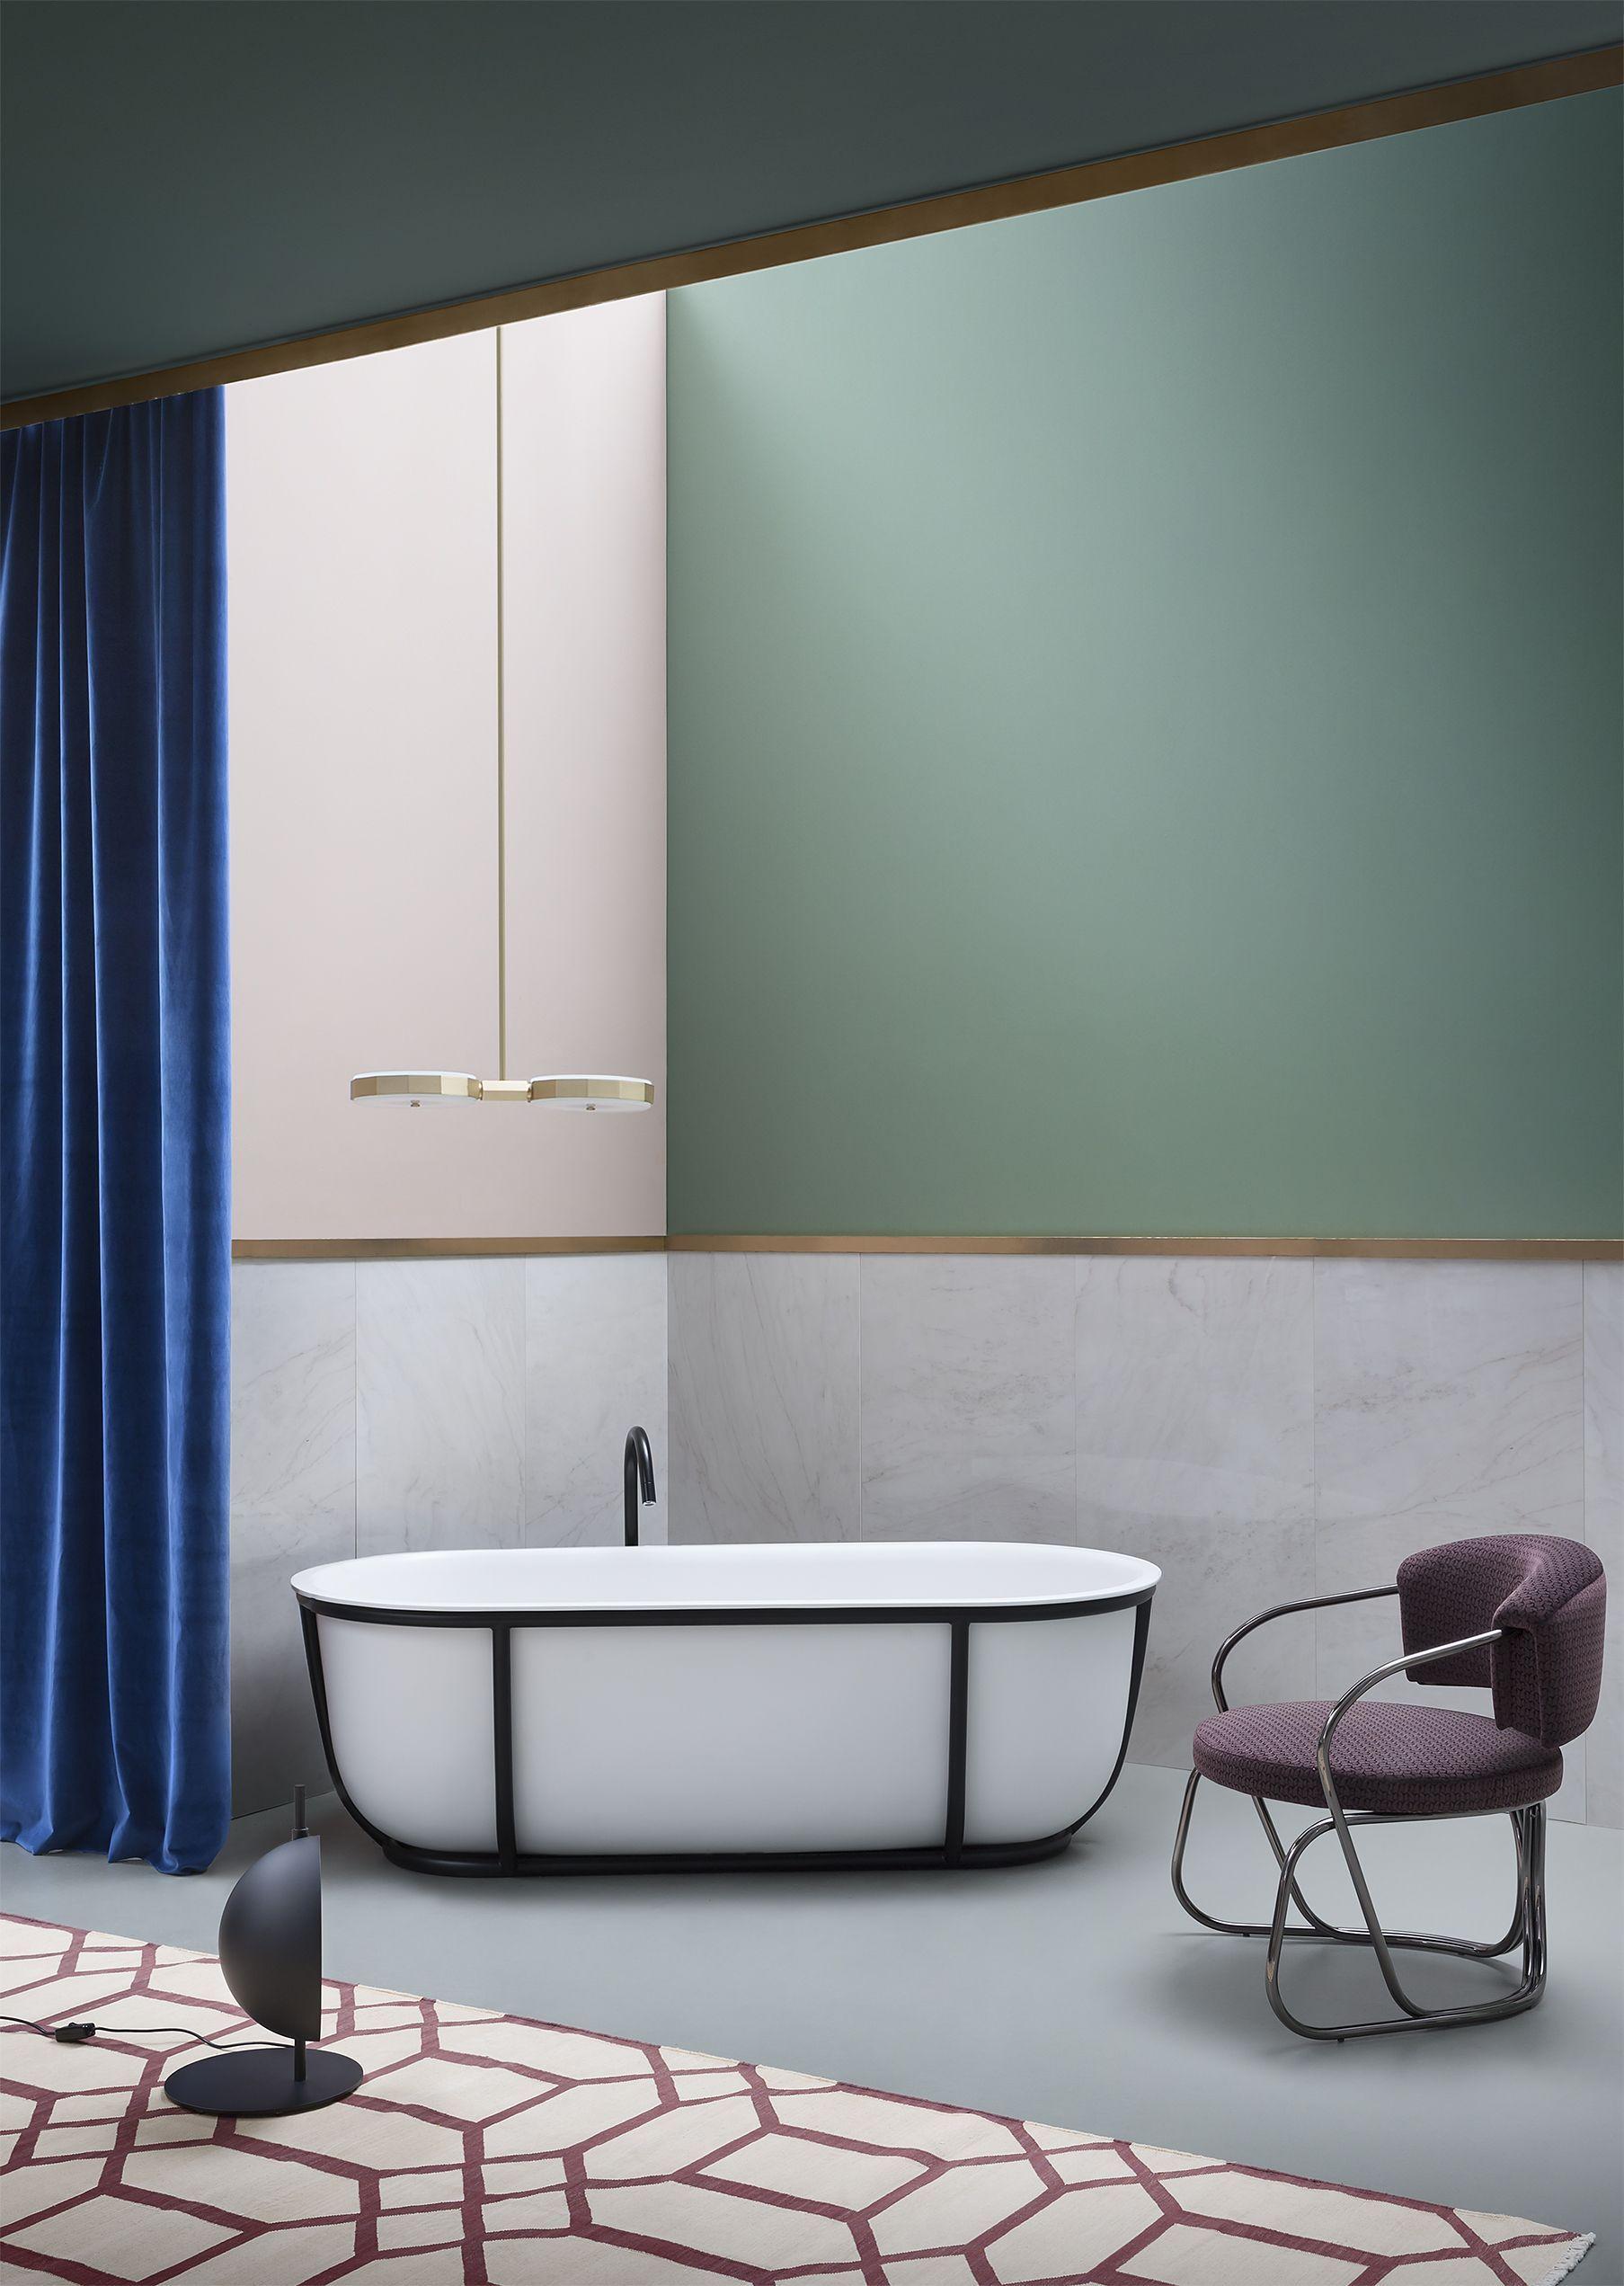 Best bathroom interior luxury furnitureue see how elegant this interiors look with best